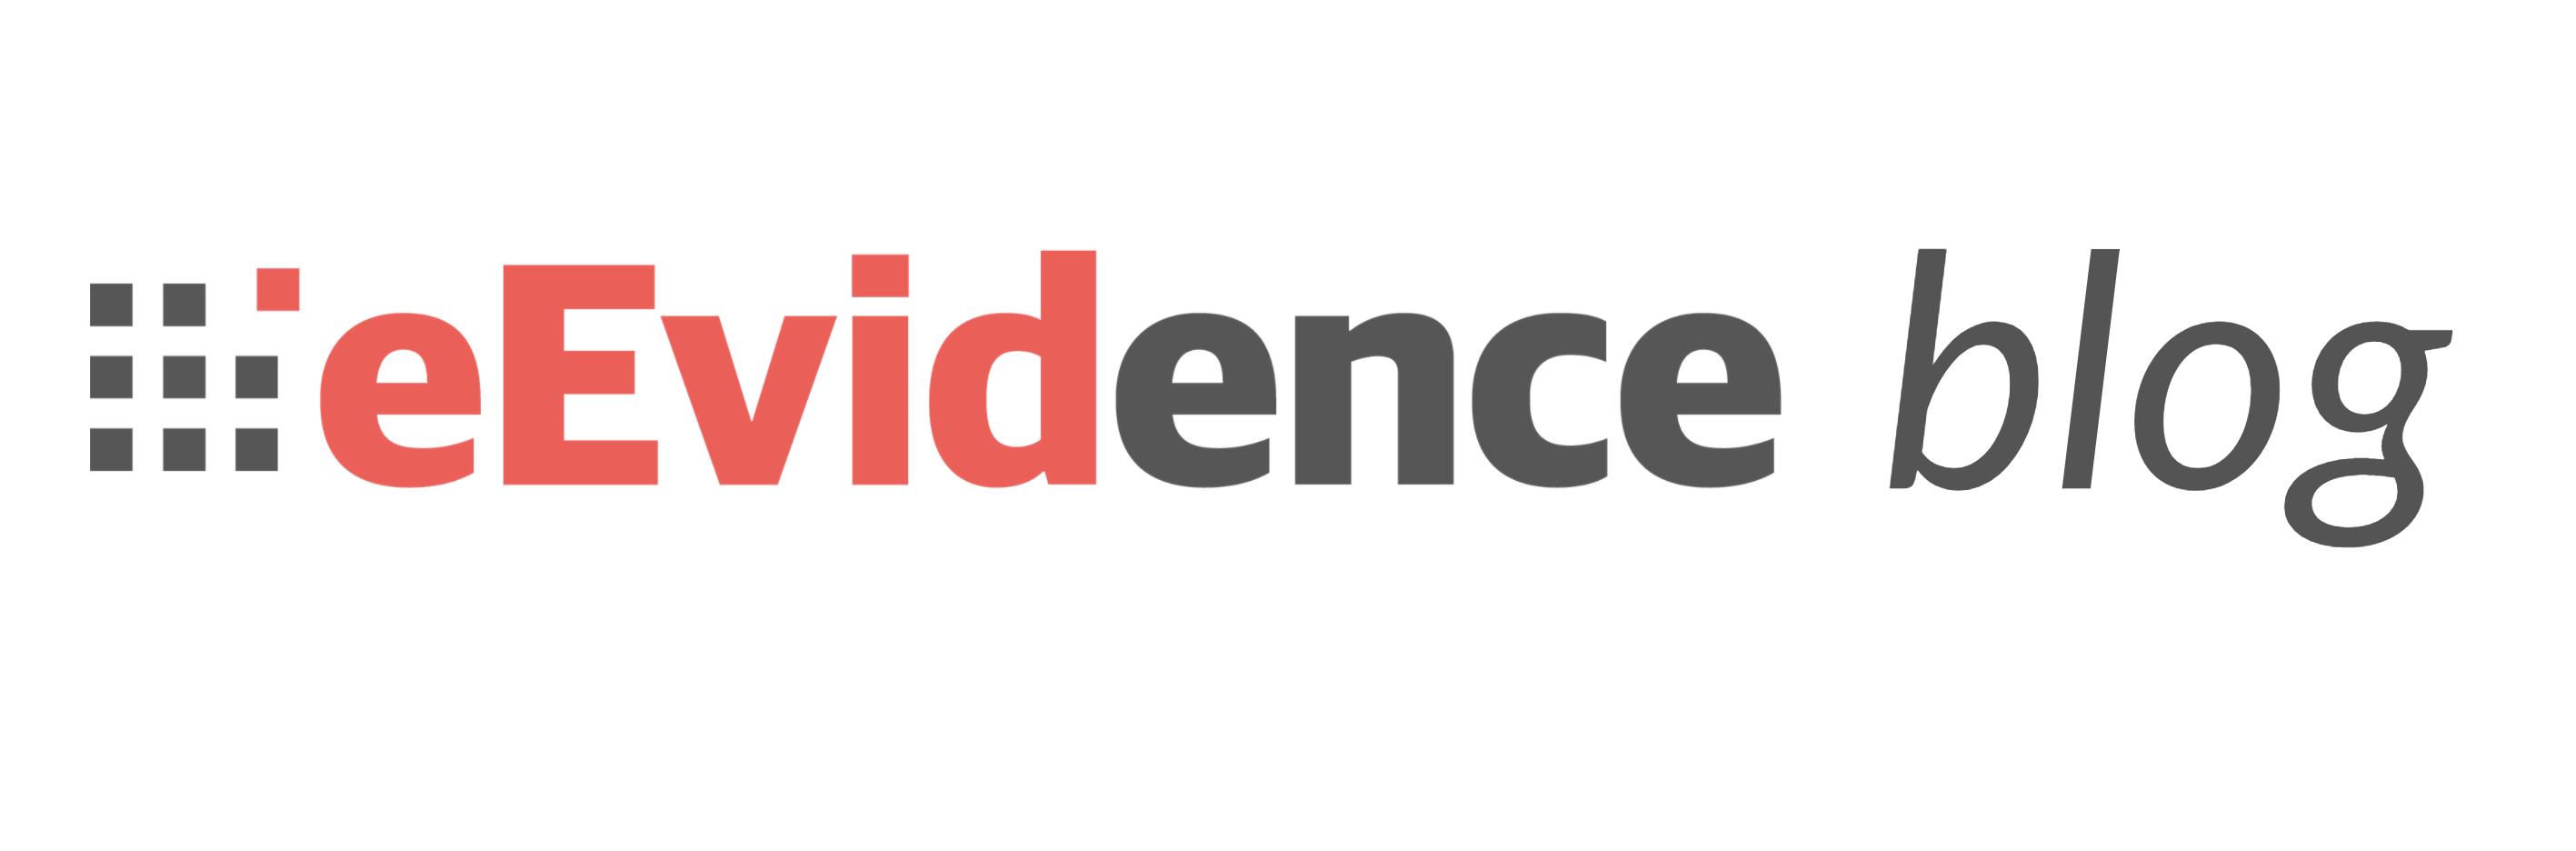 eEvidence Blog